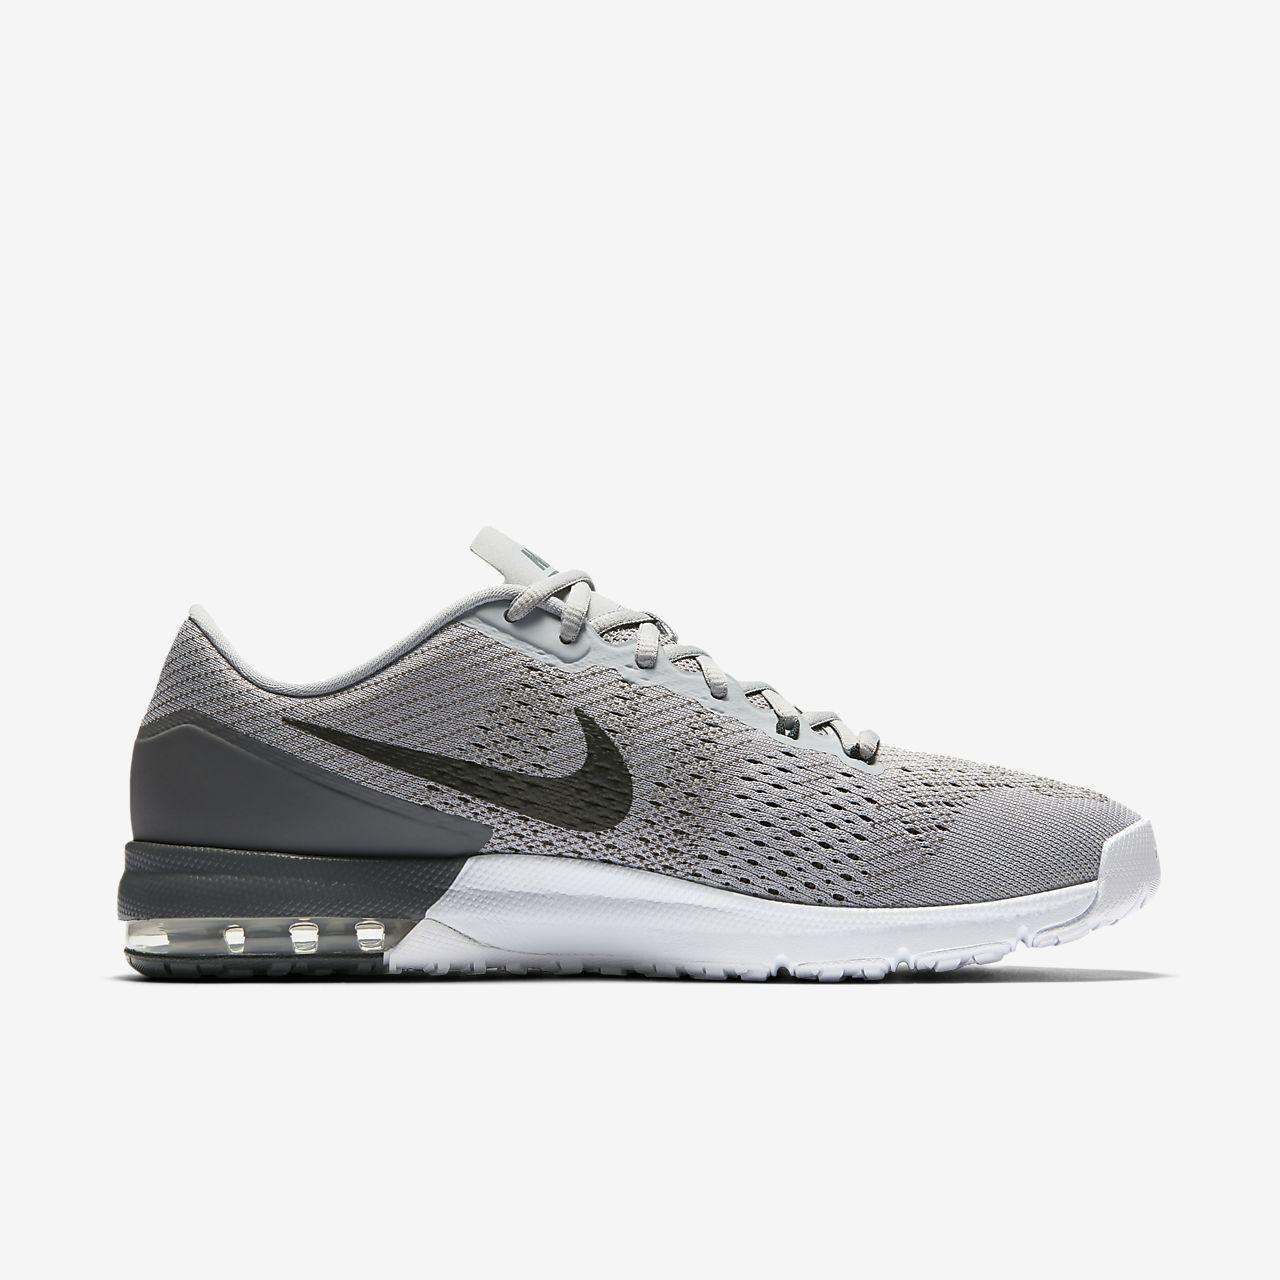 9609685c360d Nike Air Max Typha Men s Gym Training Shoe. Nike.com